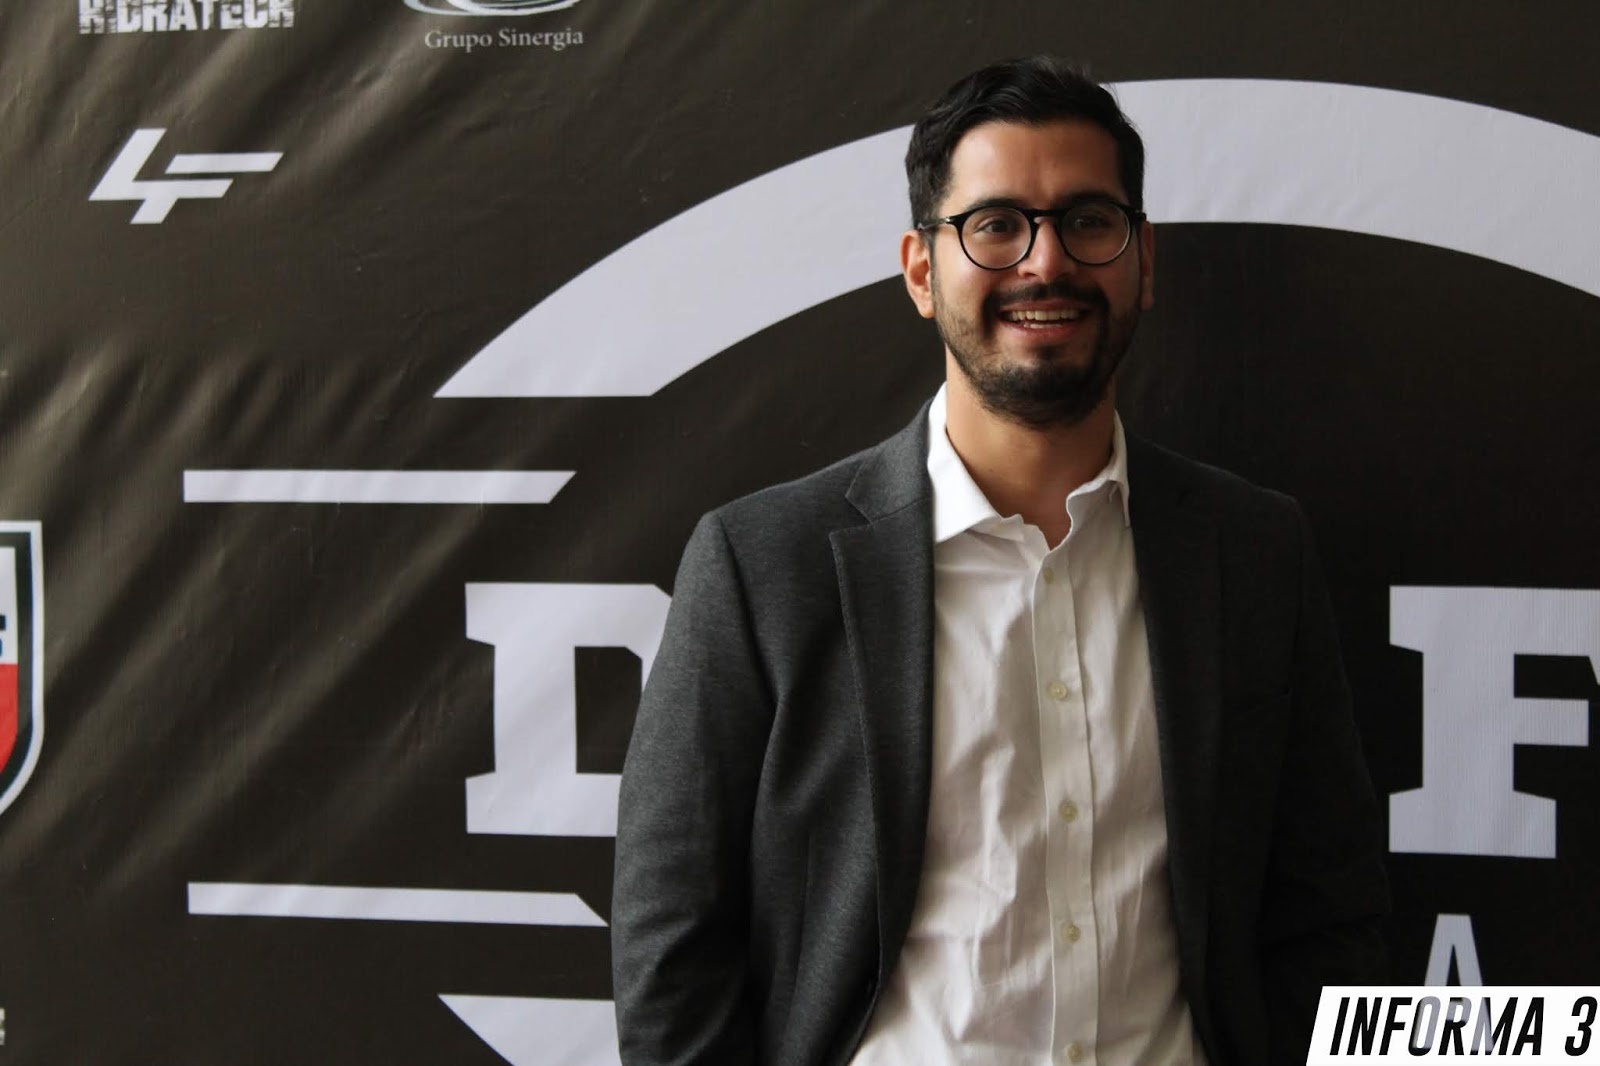 Gabriel Solares, franquiciatario de Osos de Toluca